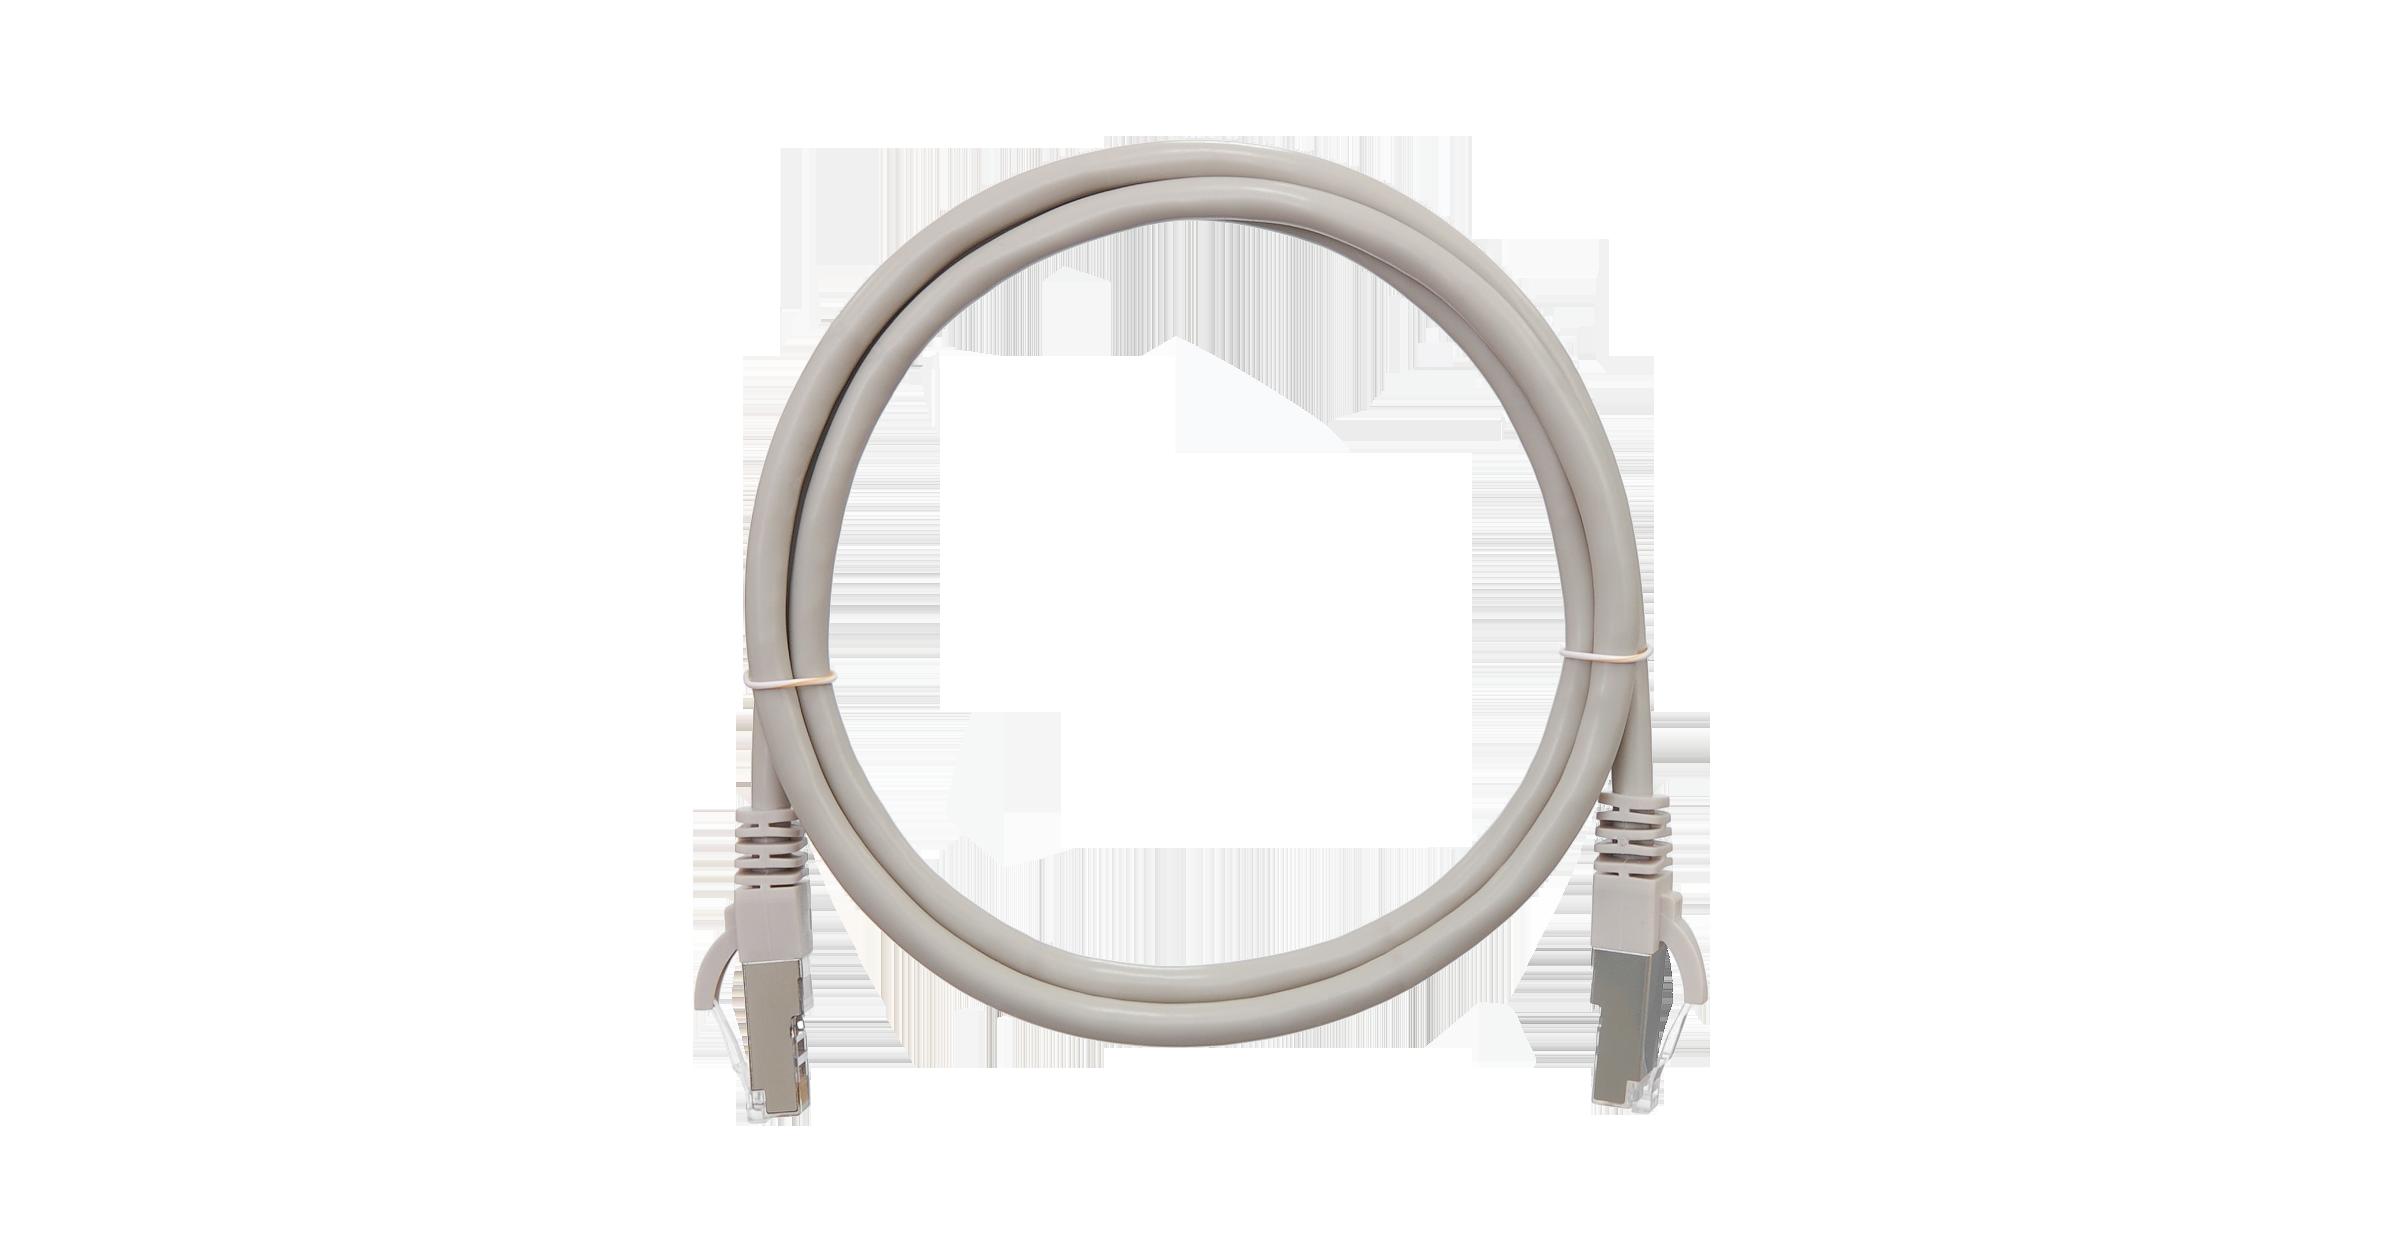 Коммутационный шнур NIKOMAX F/UTP 4 пары, Кат.5е (Класс D), 100МГц, 2хRJ45/8P8C, T568B, заливной, с защитой защелки, многожильный, BC (чистая медь), 26AWG (7х0,165мм), PVC нг(А), серый, 1,5м